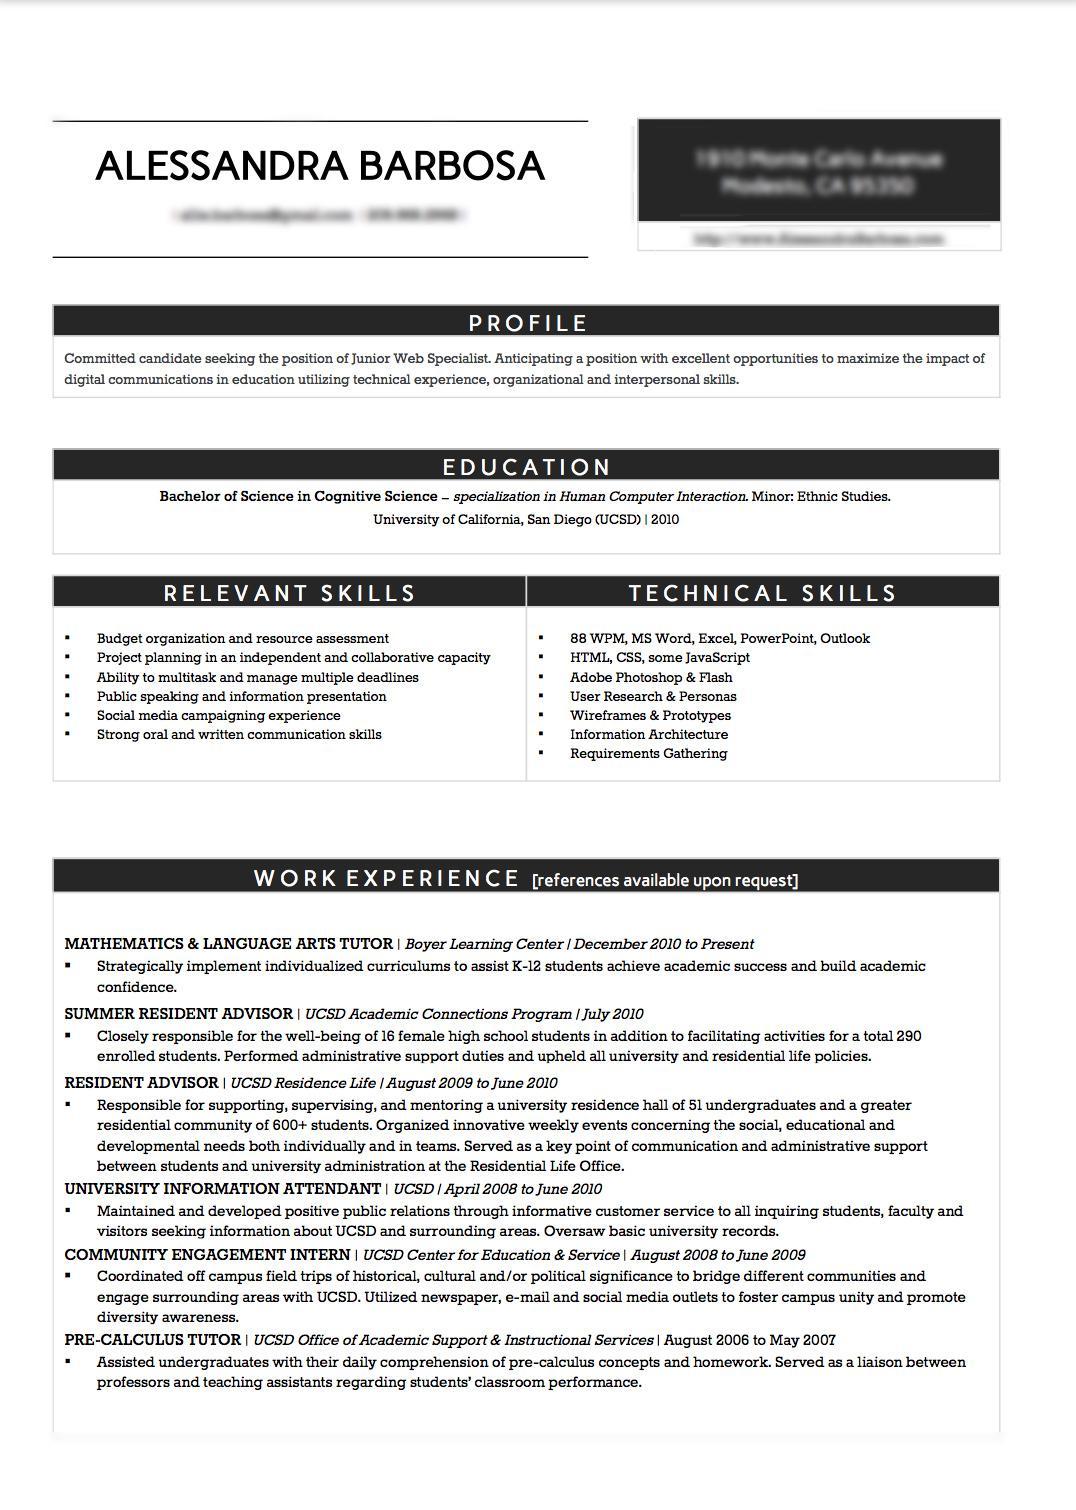 Resume Redo -- Creative yet organized | Skillshare Projects